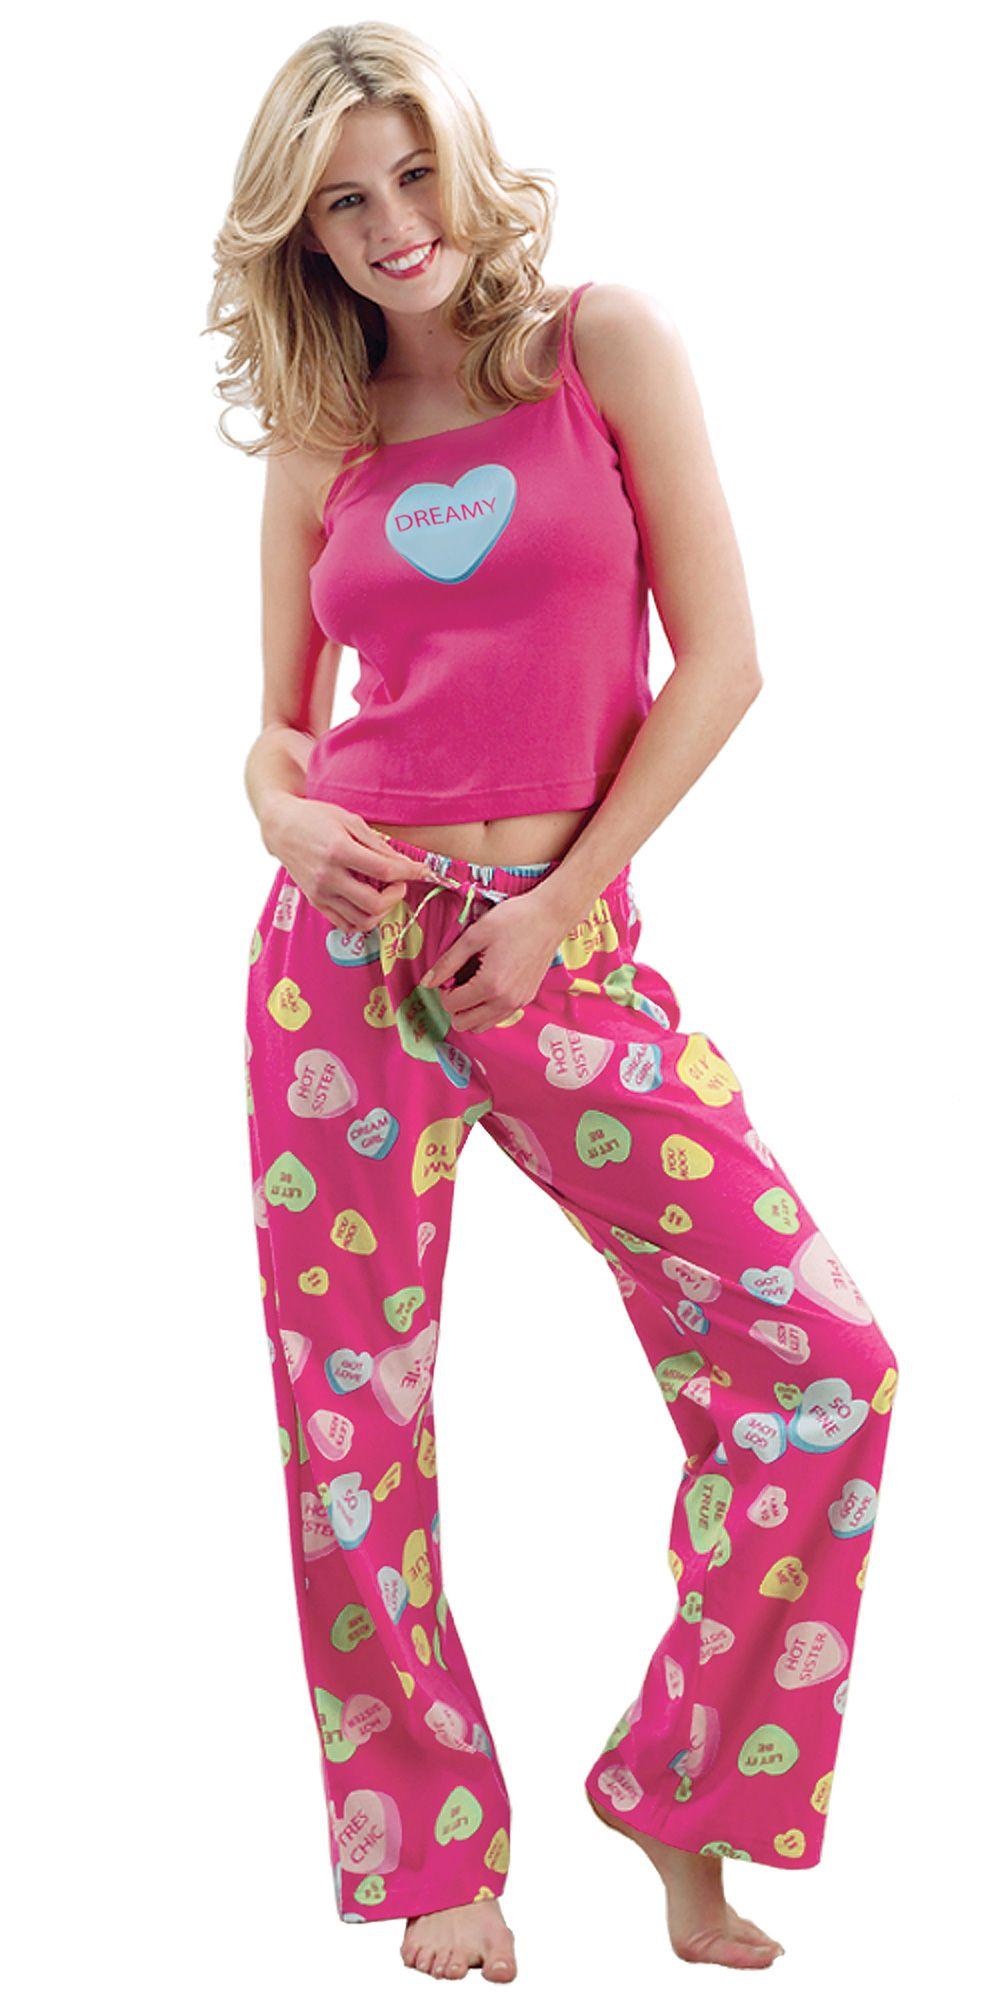 15de58169b Conversation Heart PJs - Valentine s Day Pajamas from PajamaGram.  54.99   ValentinesDay  Hearts  Pajamas